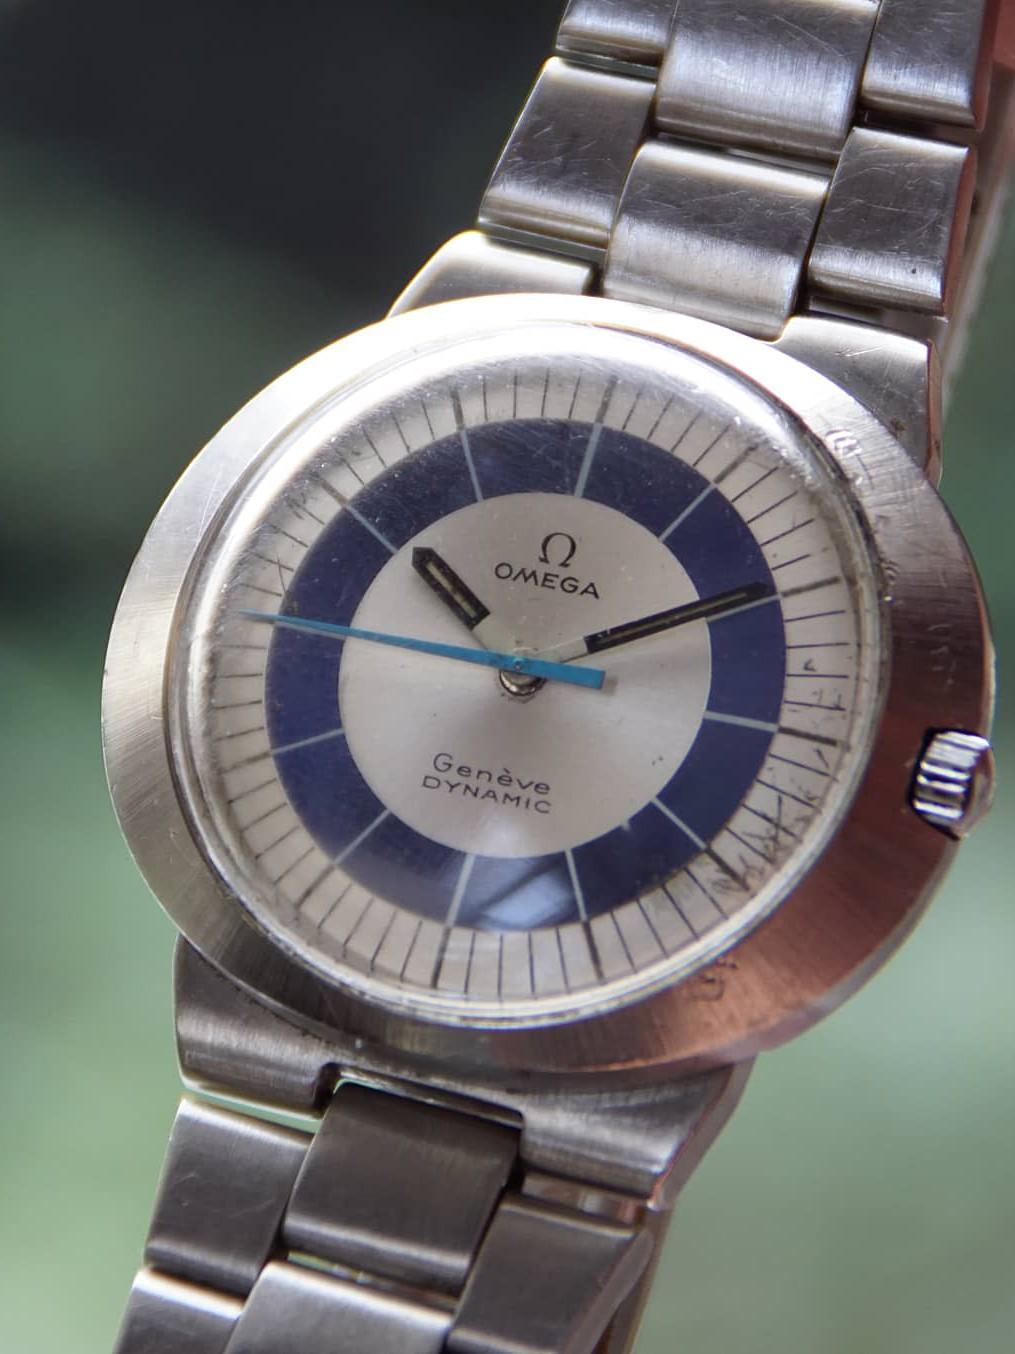 Omega Genève Dynamic 165.039